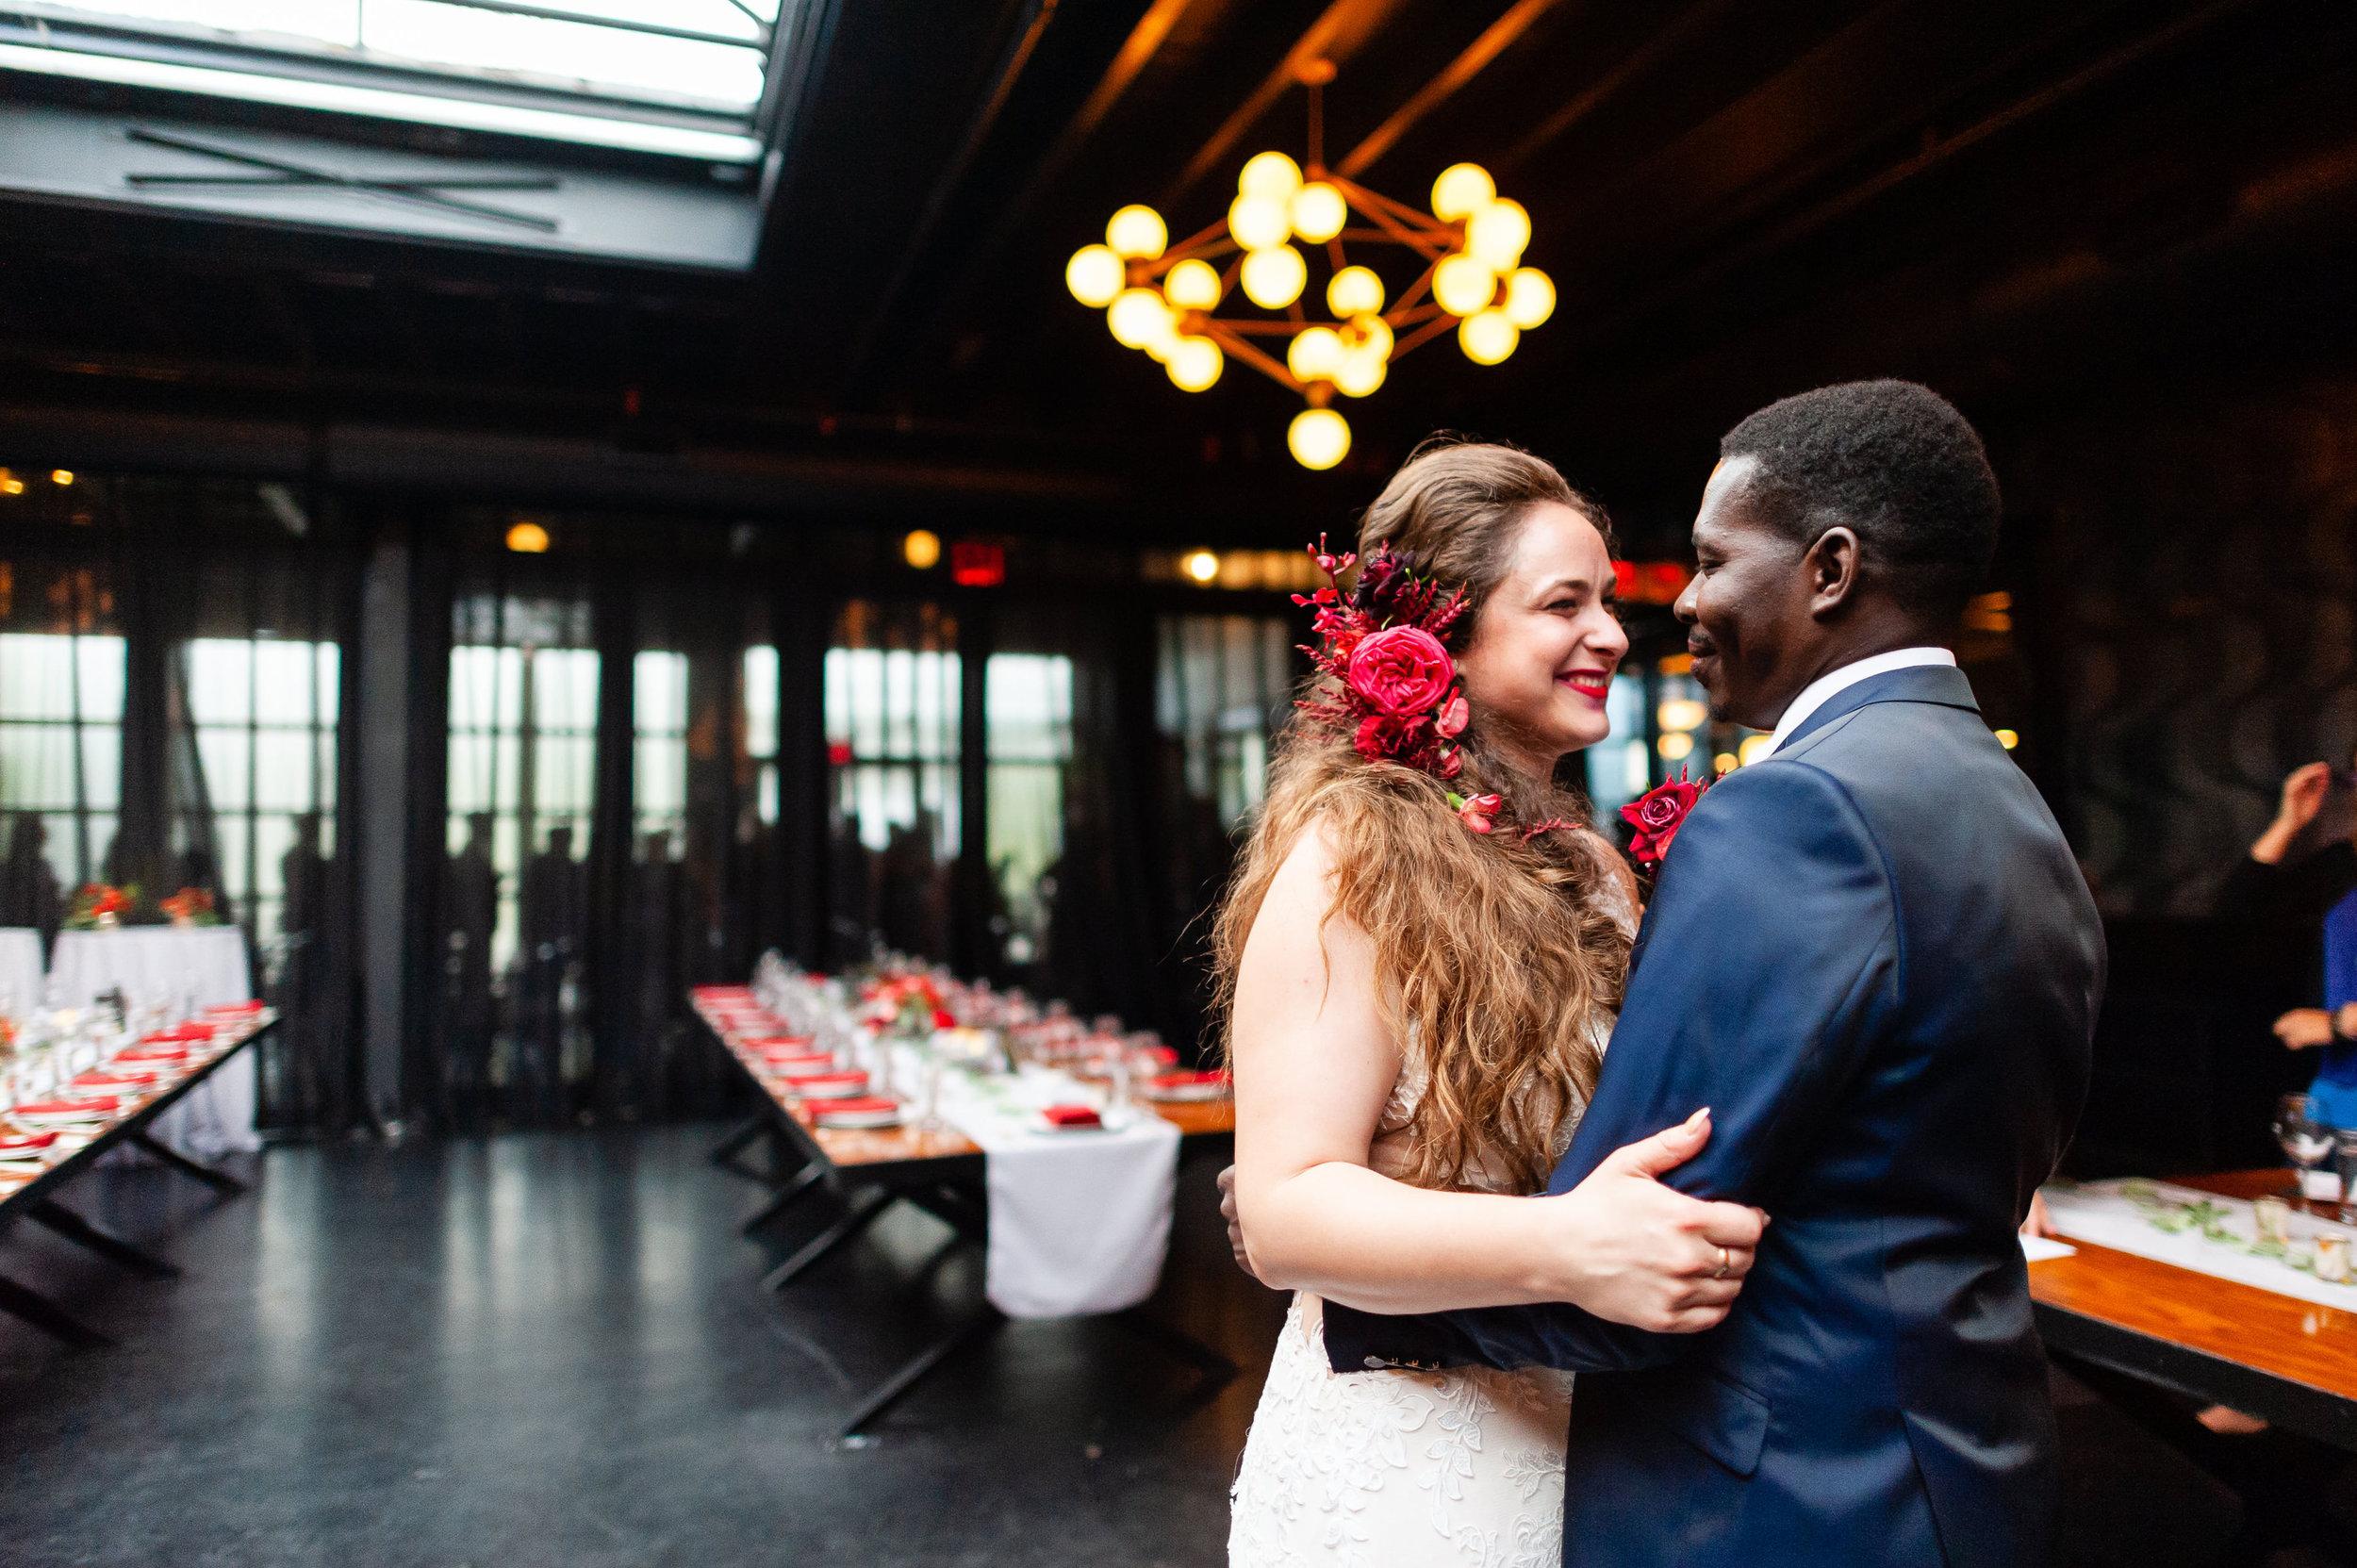 Elizabeth_Joab_multicultural_wedding_Petronella_Photography_716.jpg